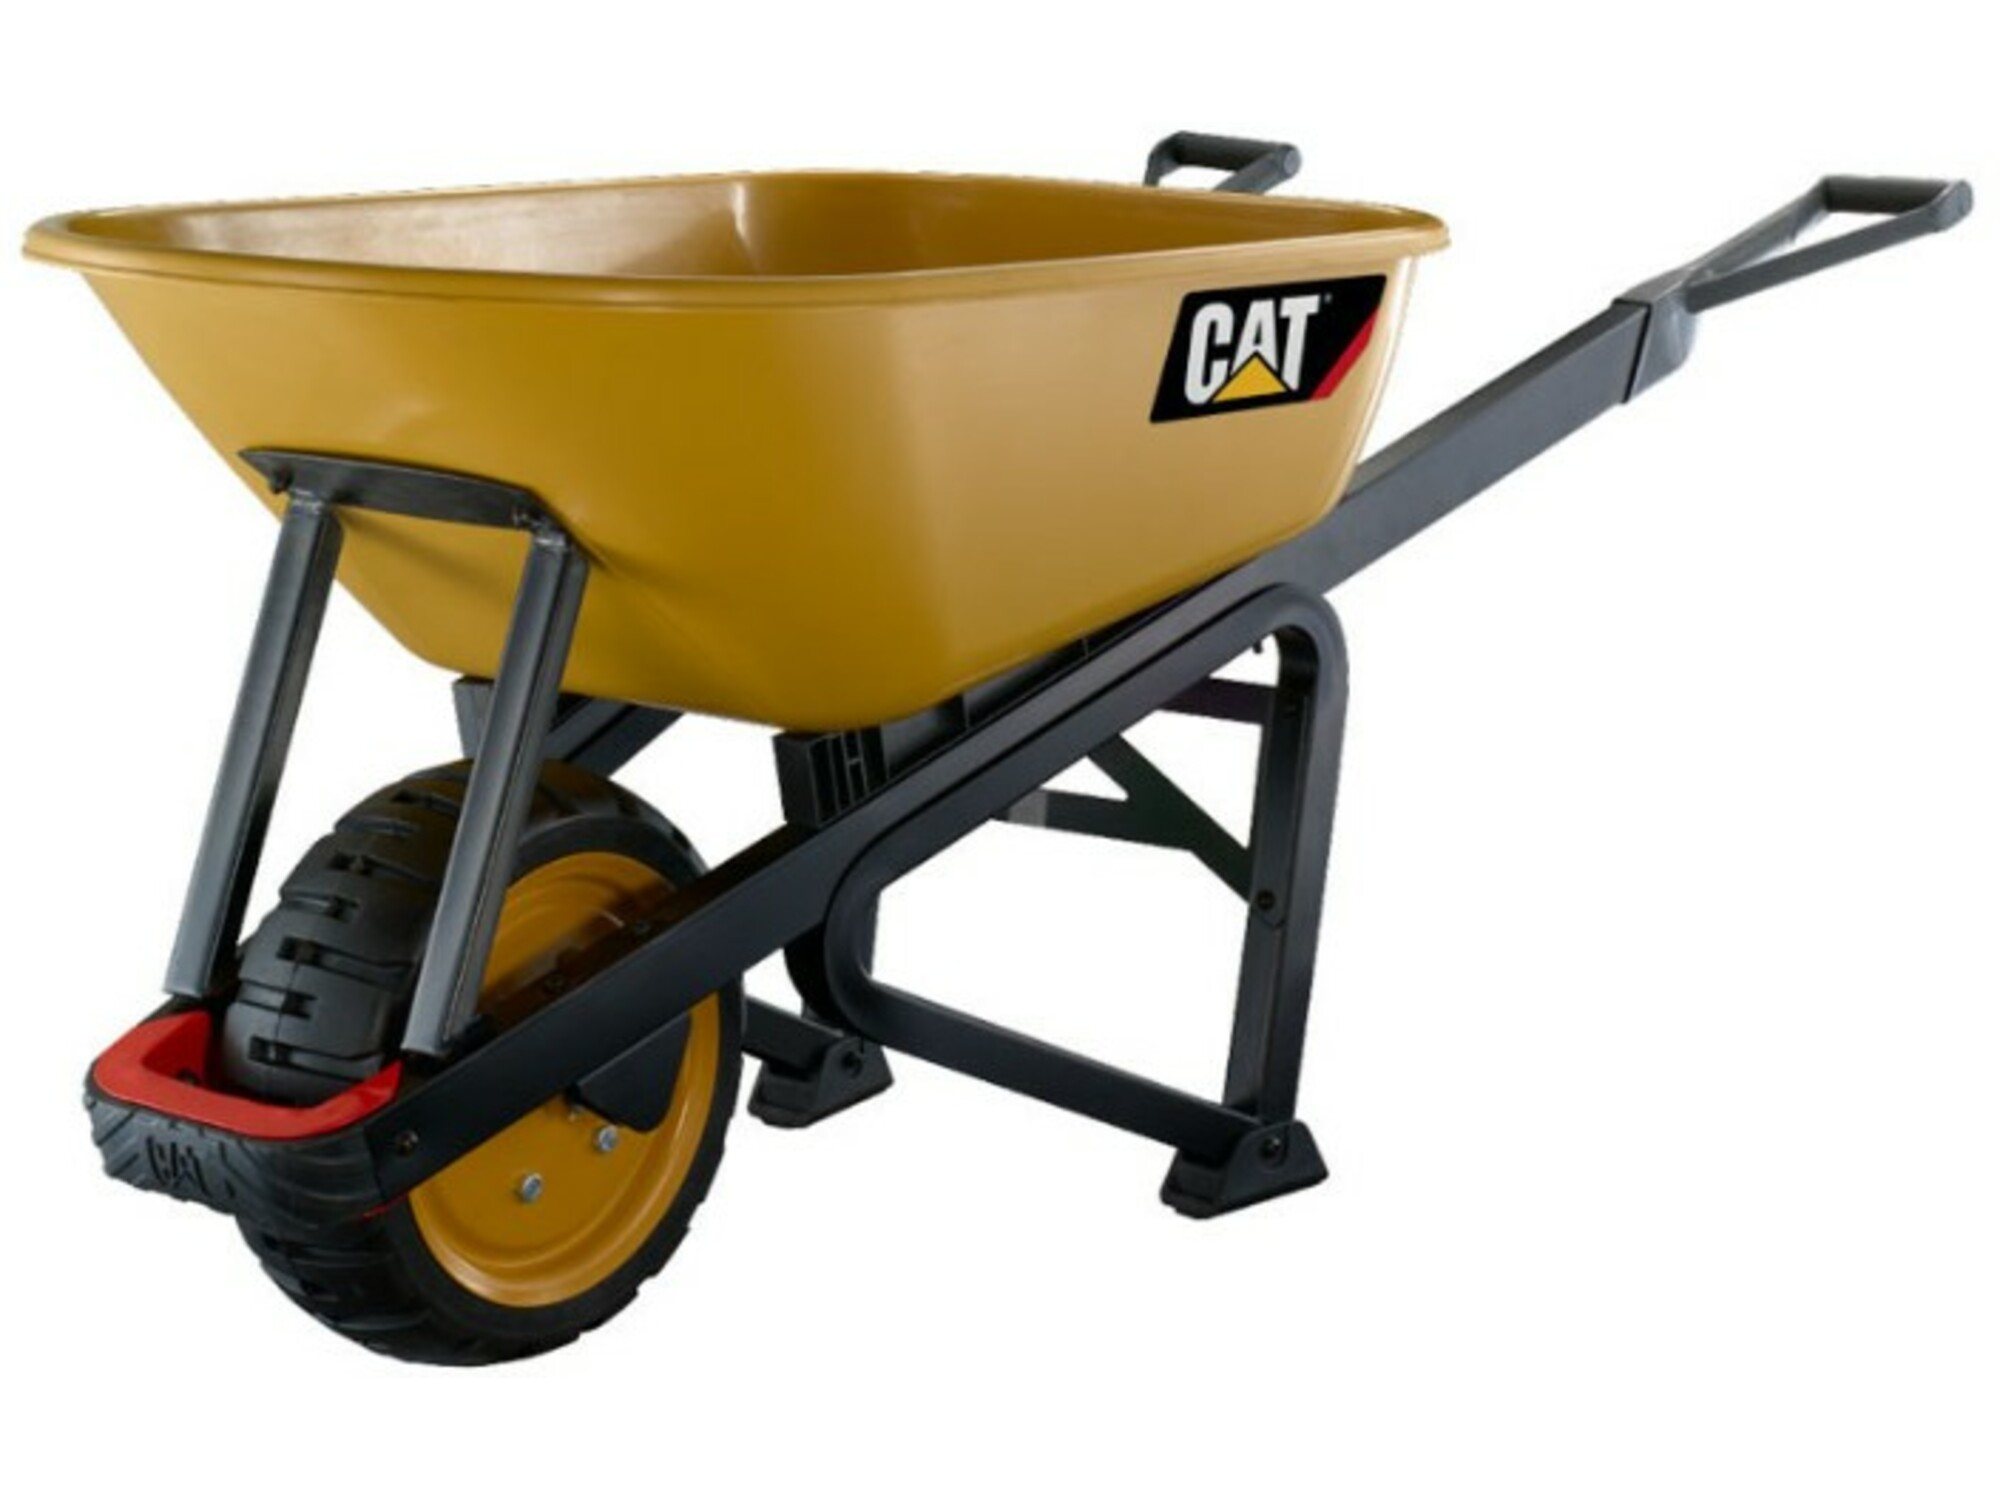 CATERPILLAR samokolnica CAT K22 200 8